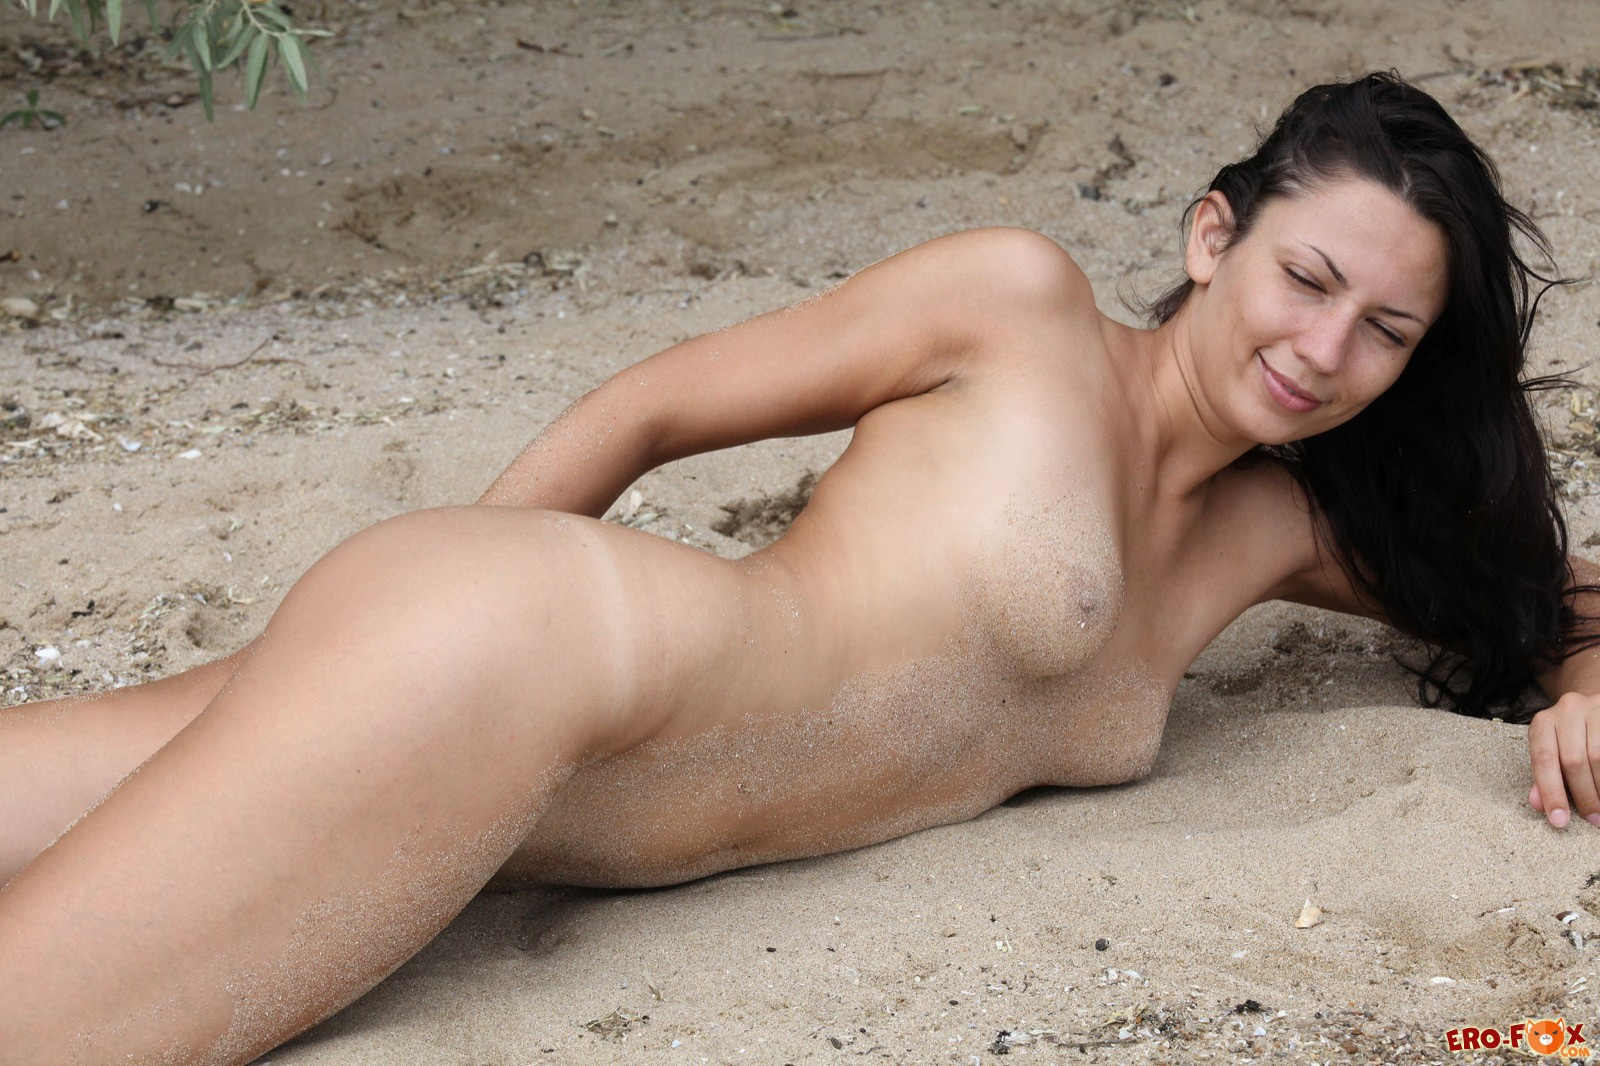 Тридцатилетняя девушка снимает трусики на пляже - фото